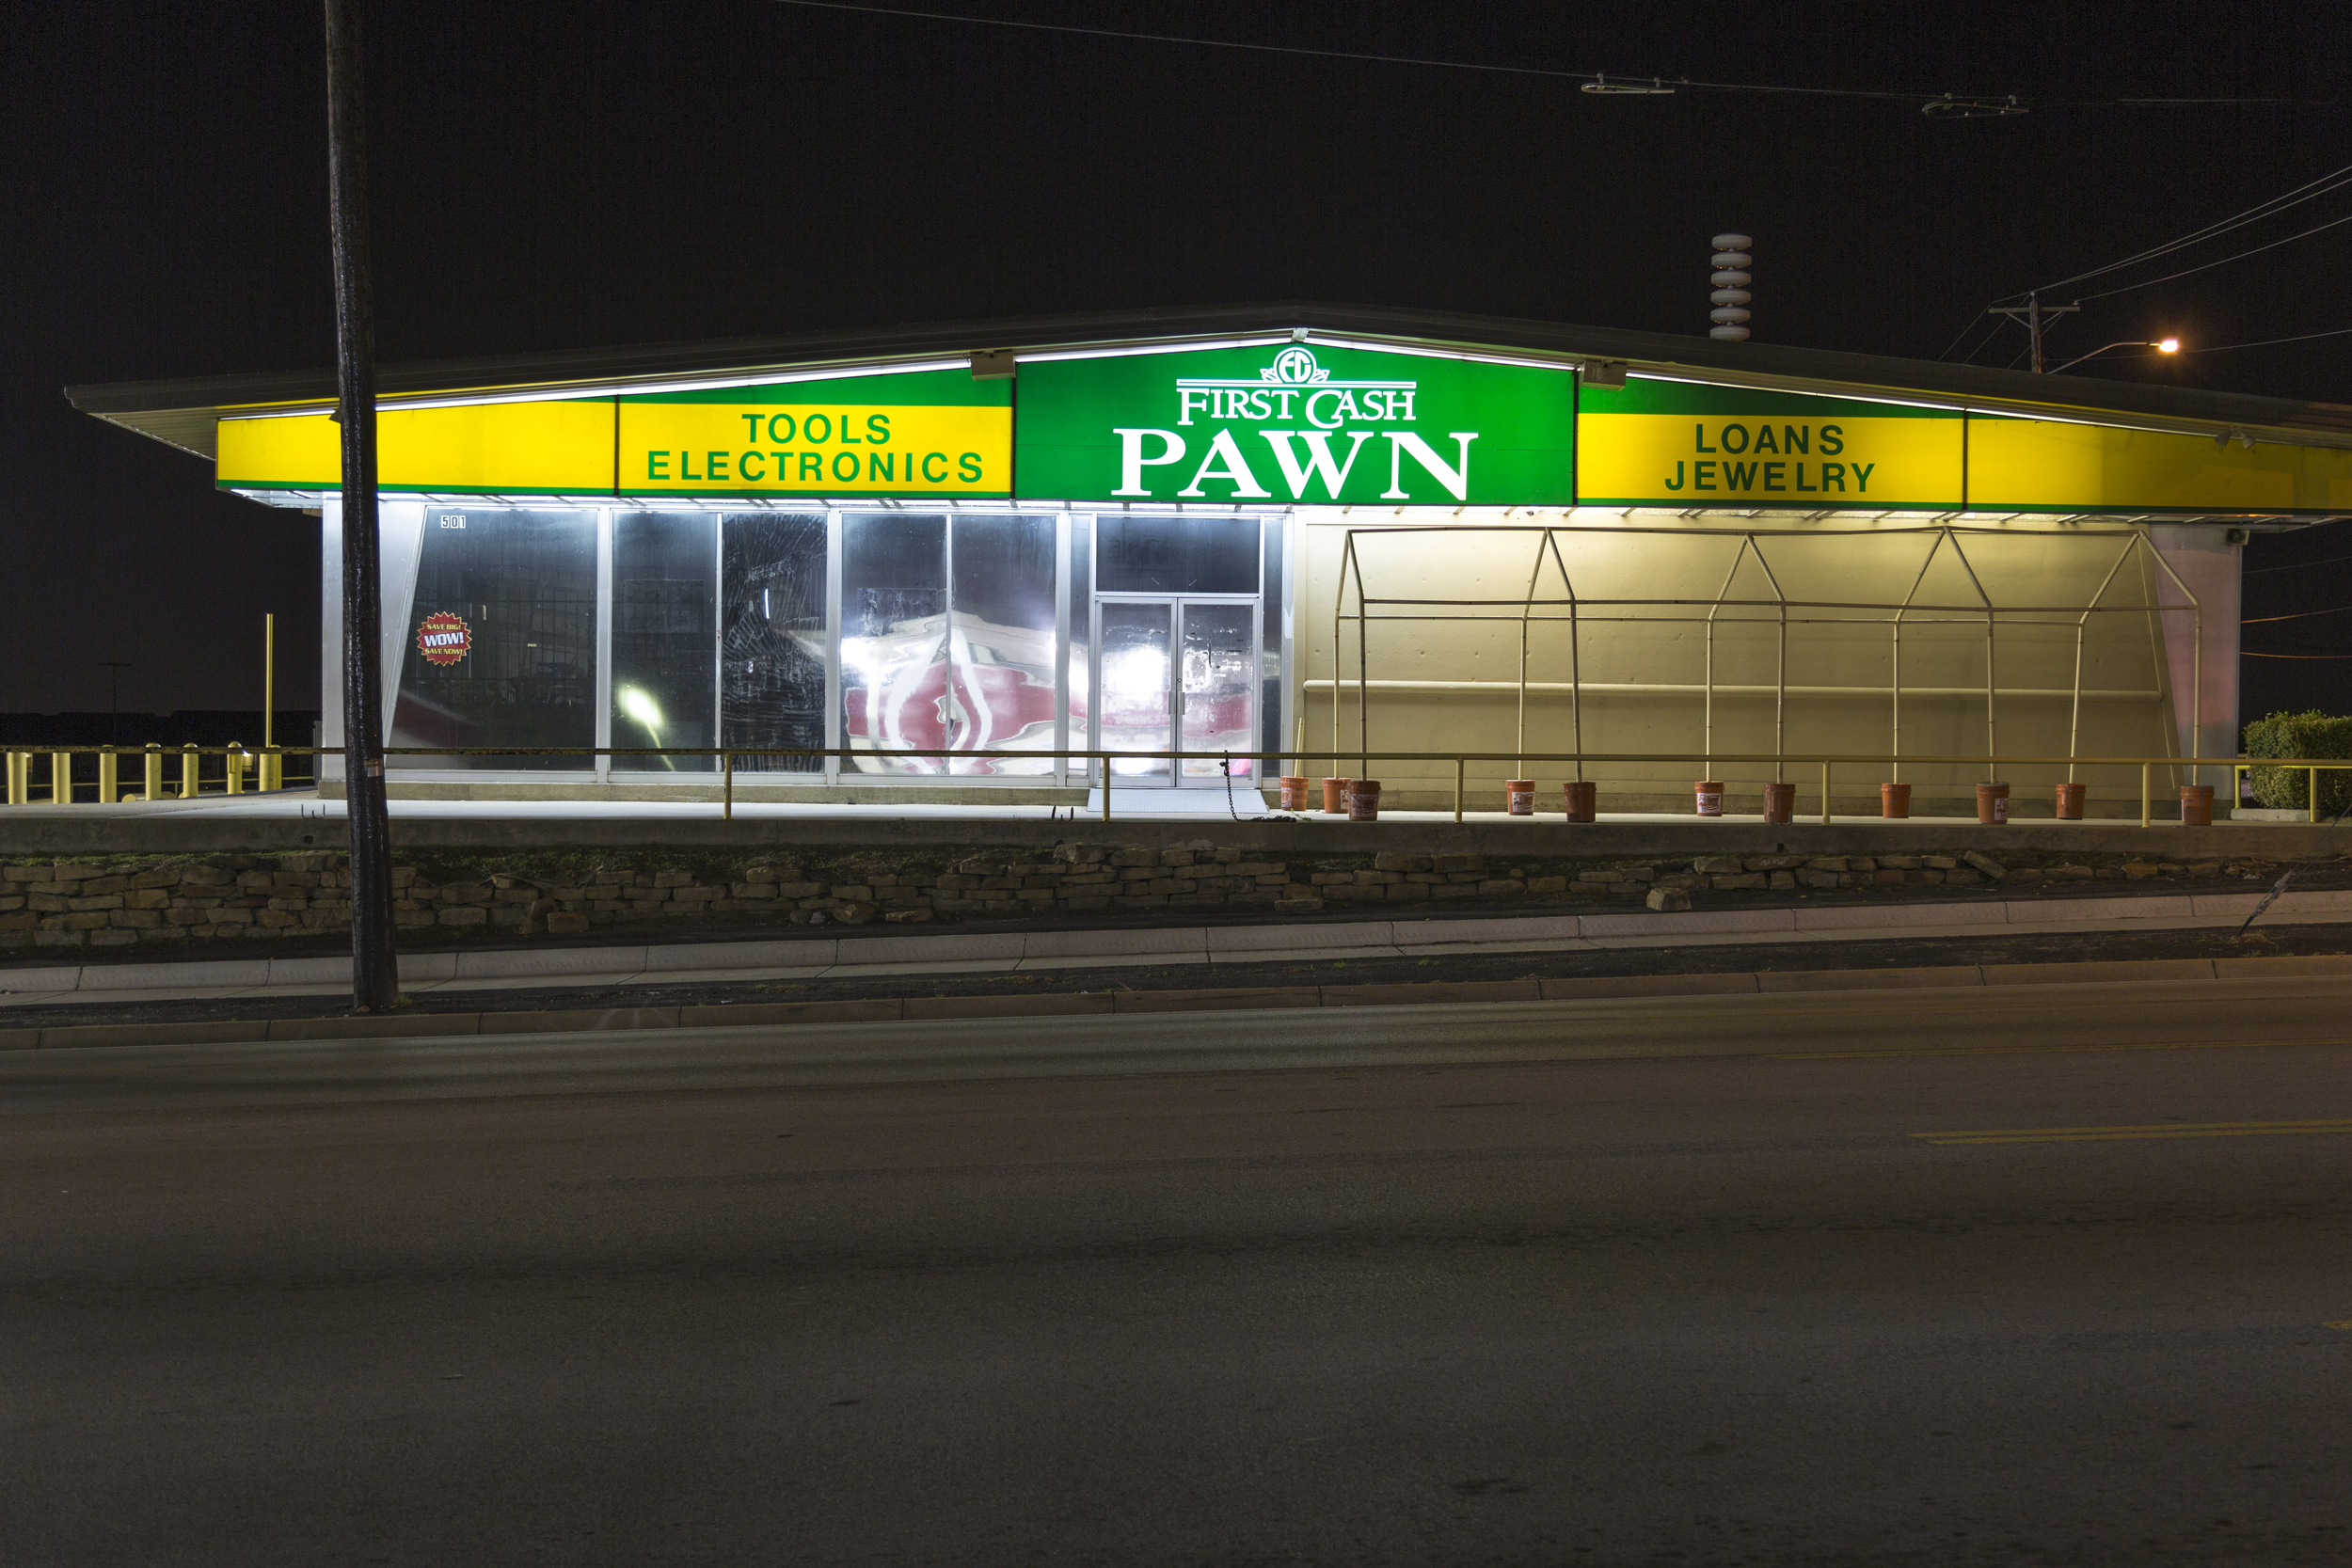 Pawn Shop Series - First Cash Pawn